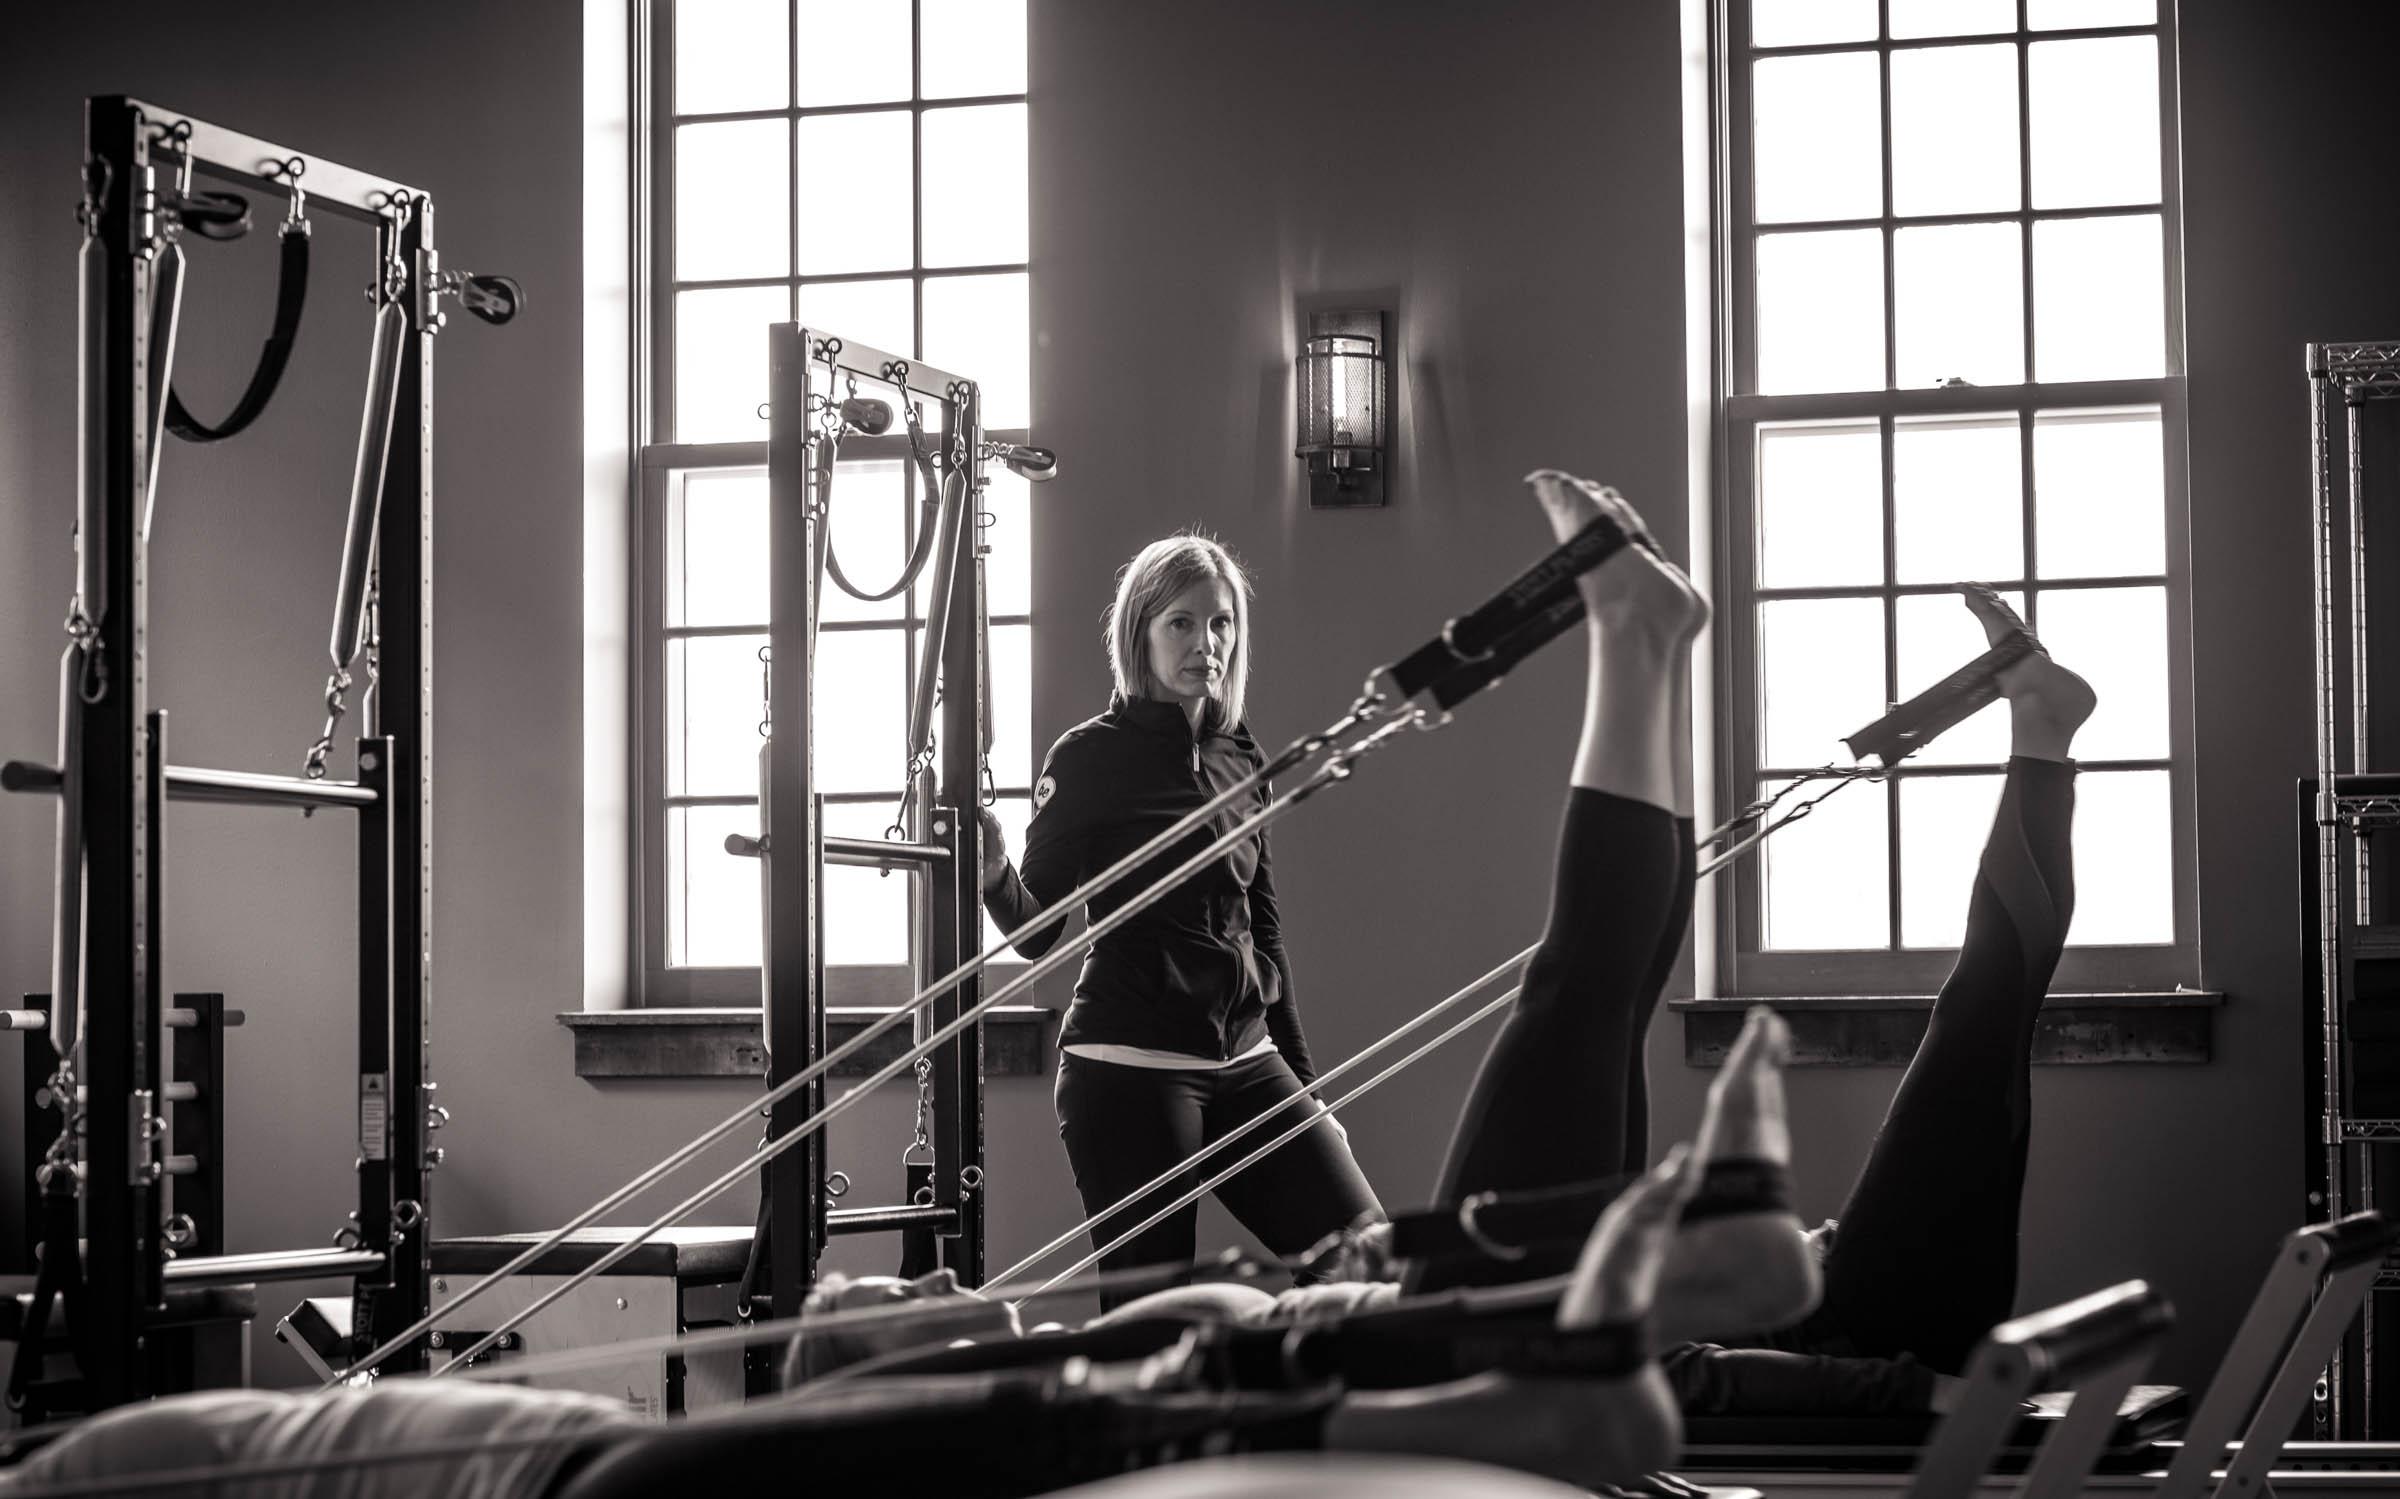 be_fitness_instructors_delafield_0236.jpg